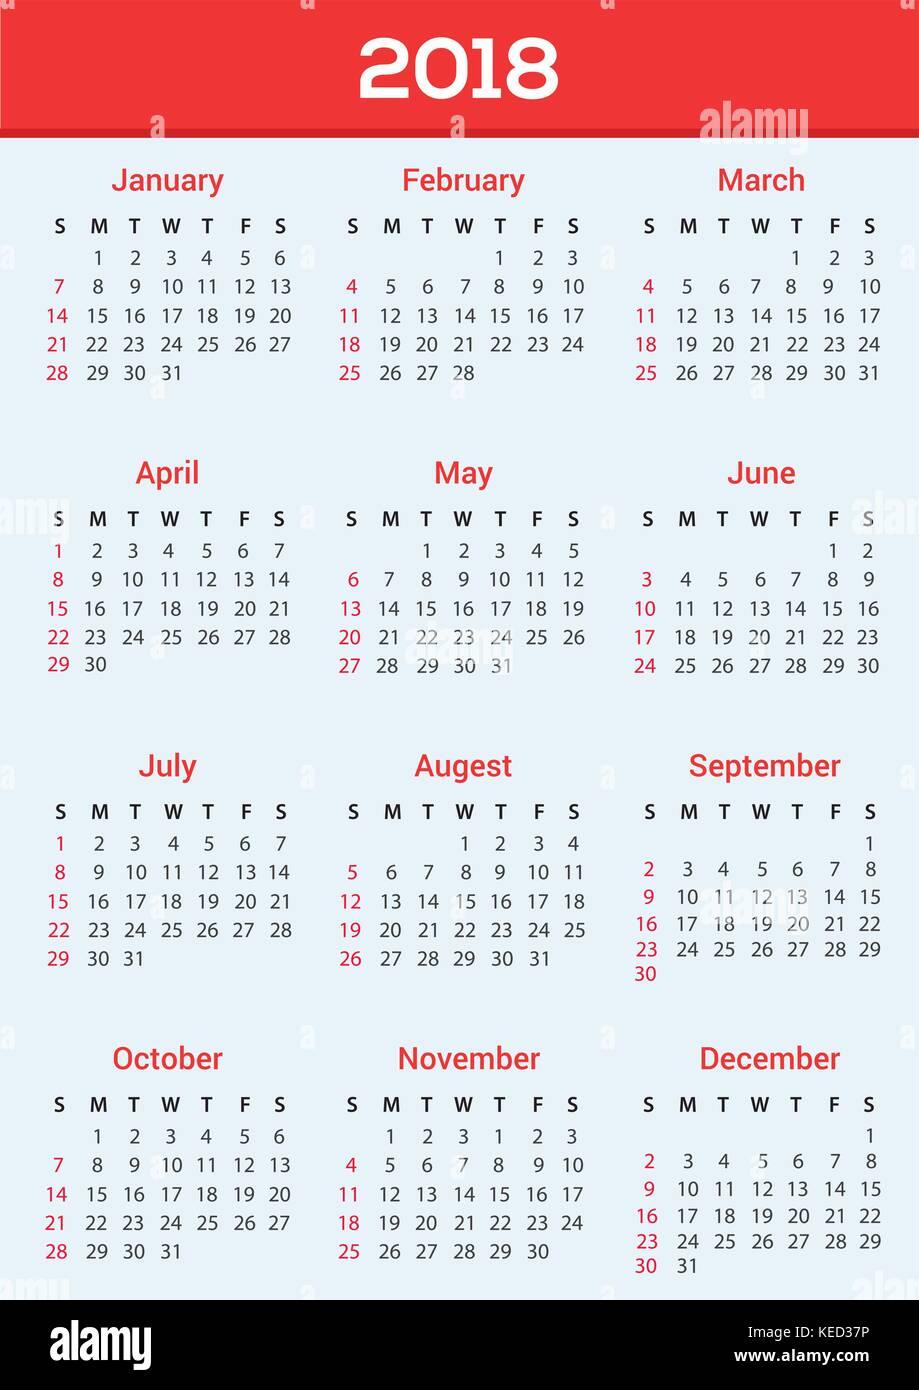 Calendar Design Template 2018 Stock Vector Art Illustration